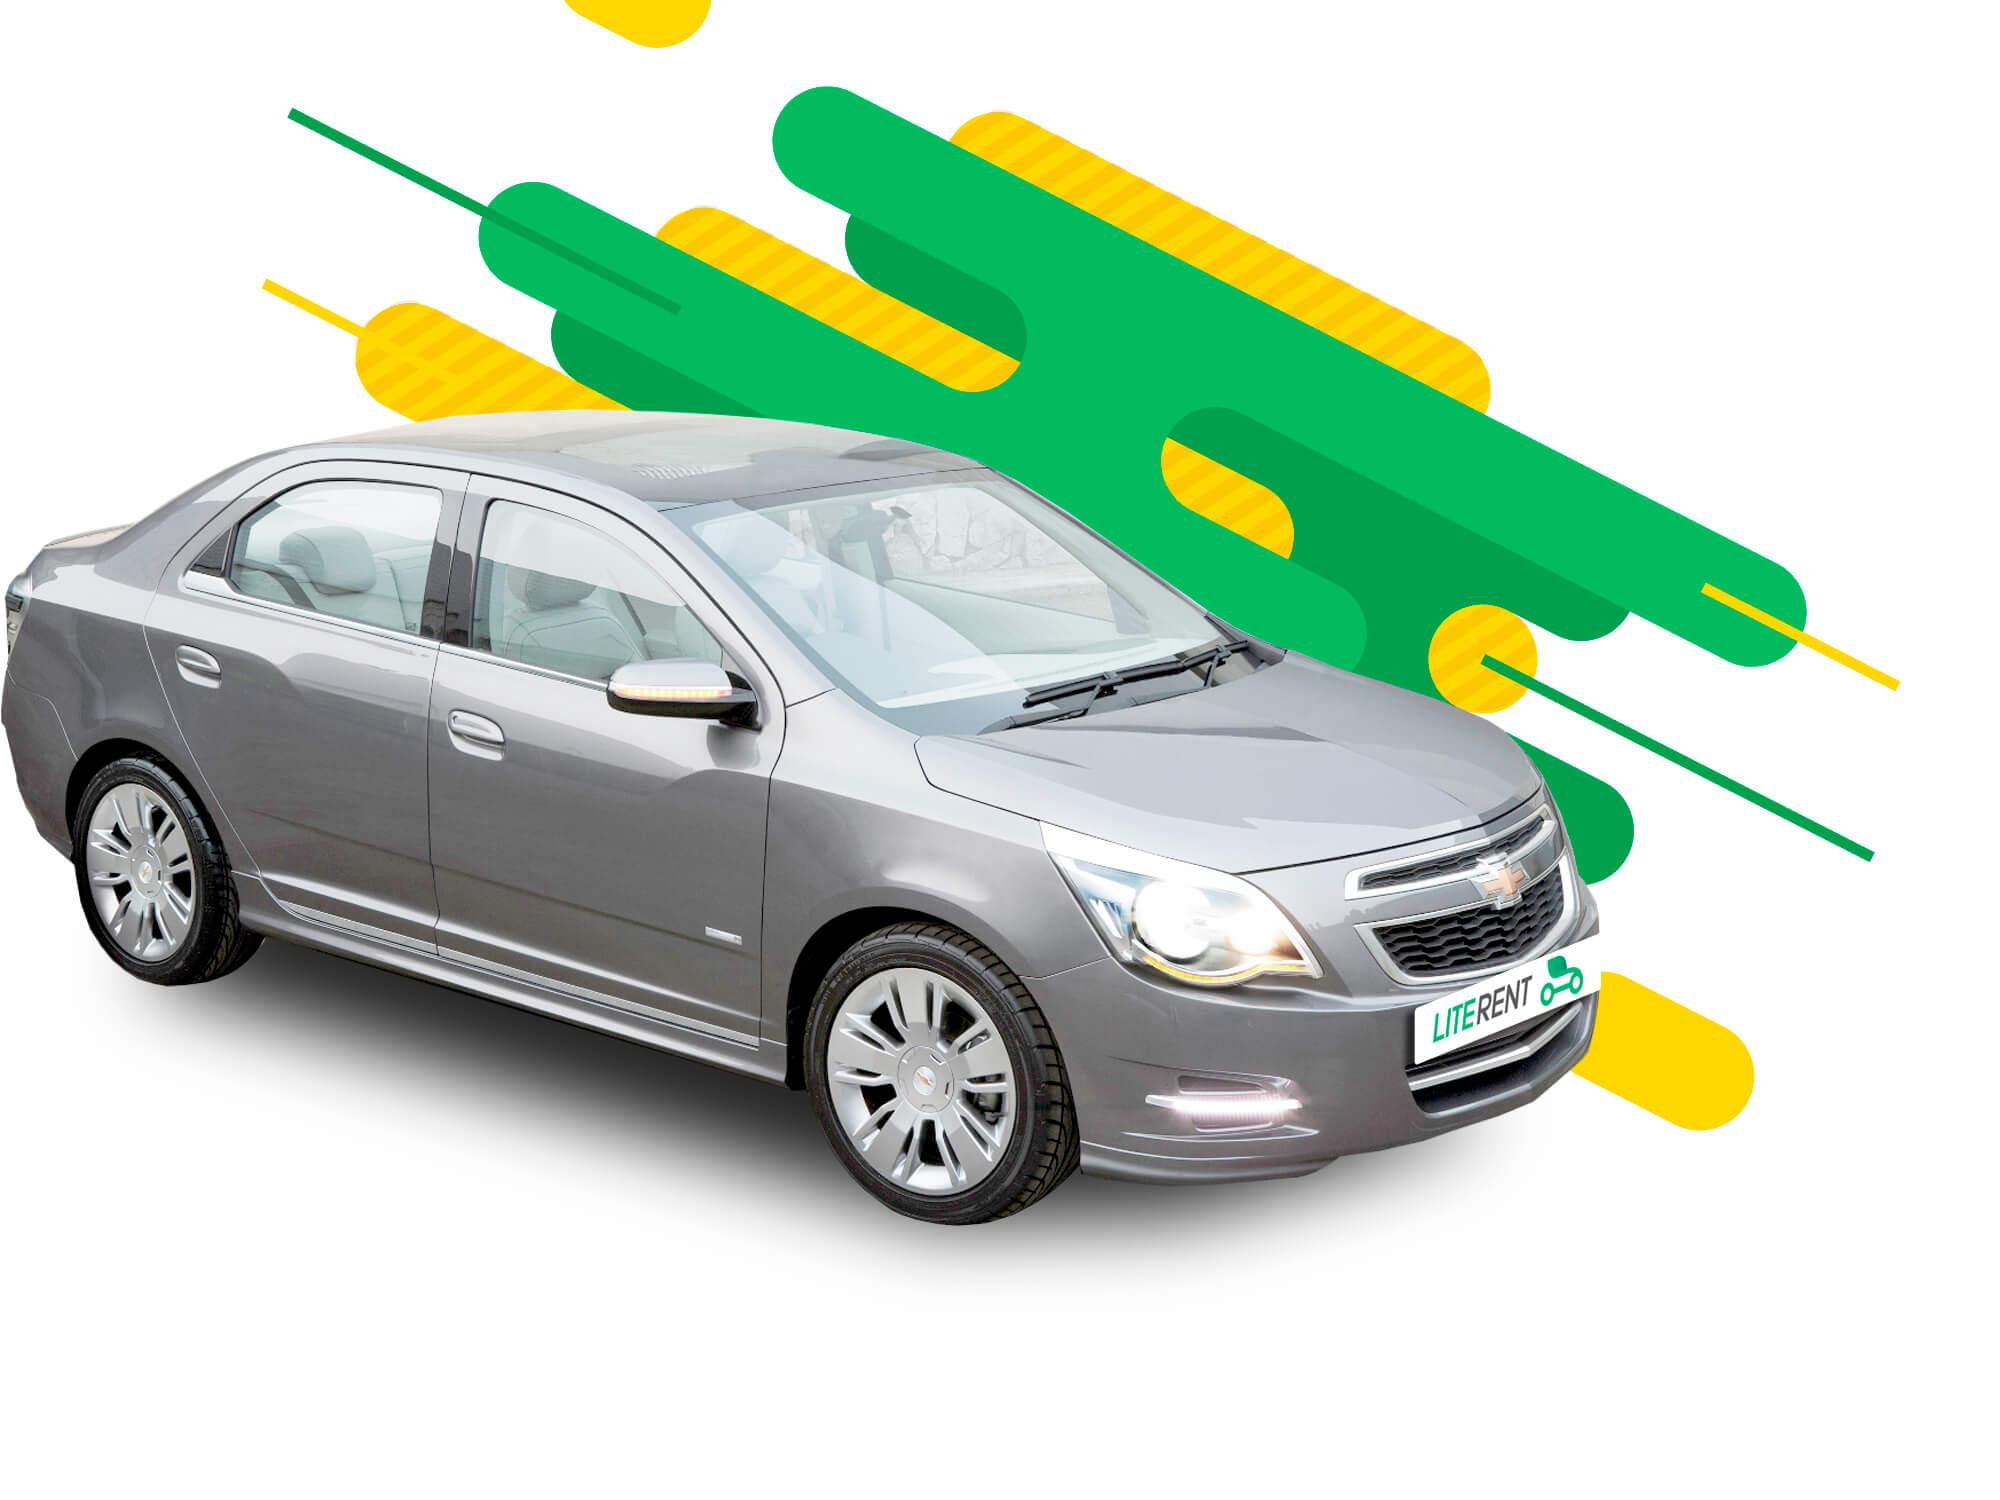 Chevrolet Cobalt 1.6 (Silver)